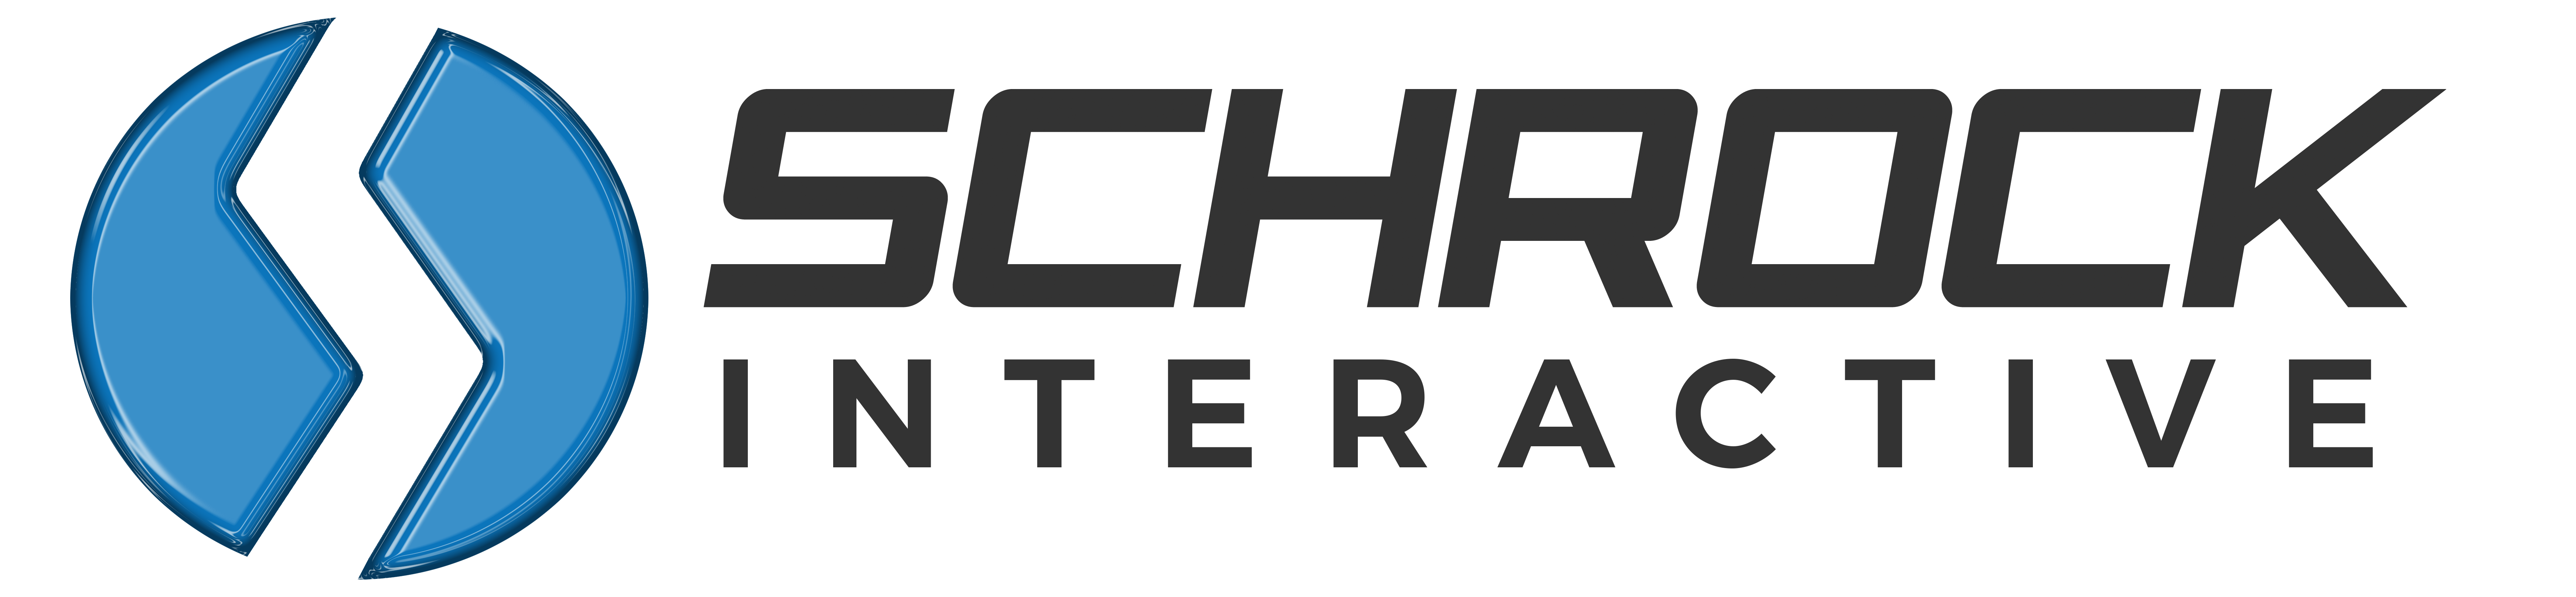 Schrock Interactive